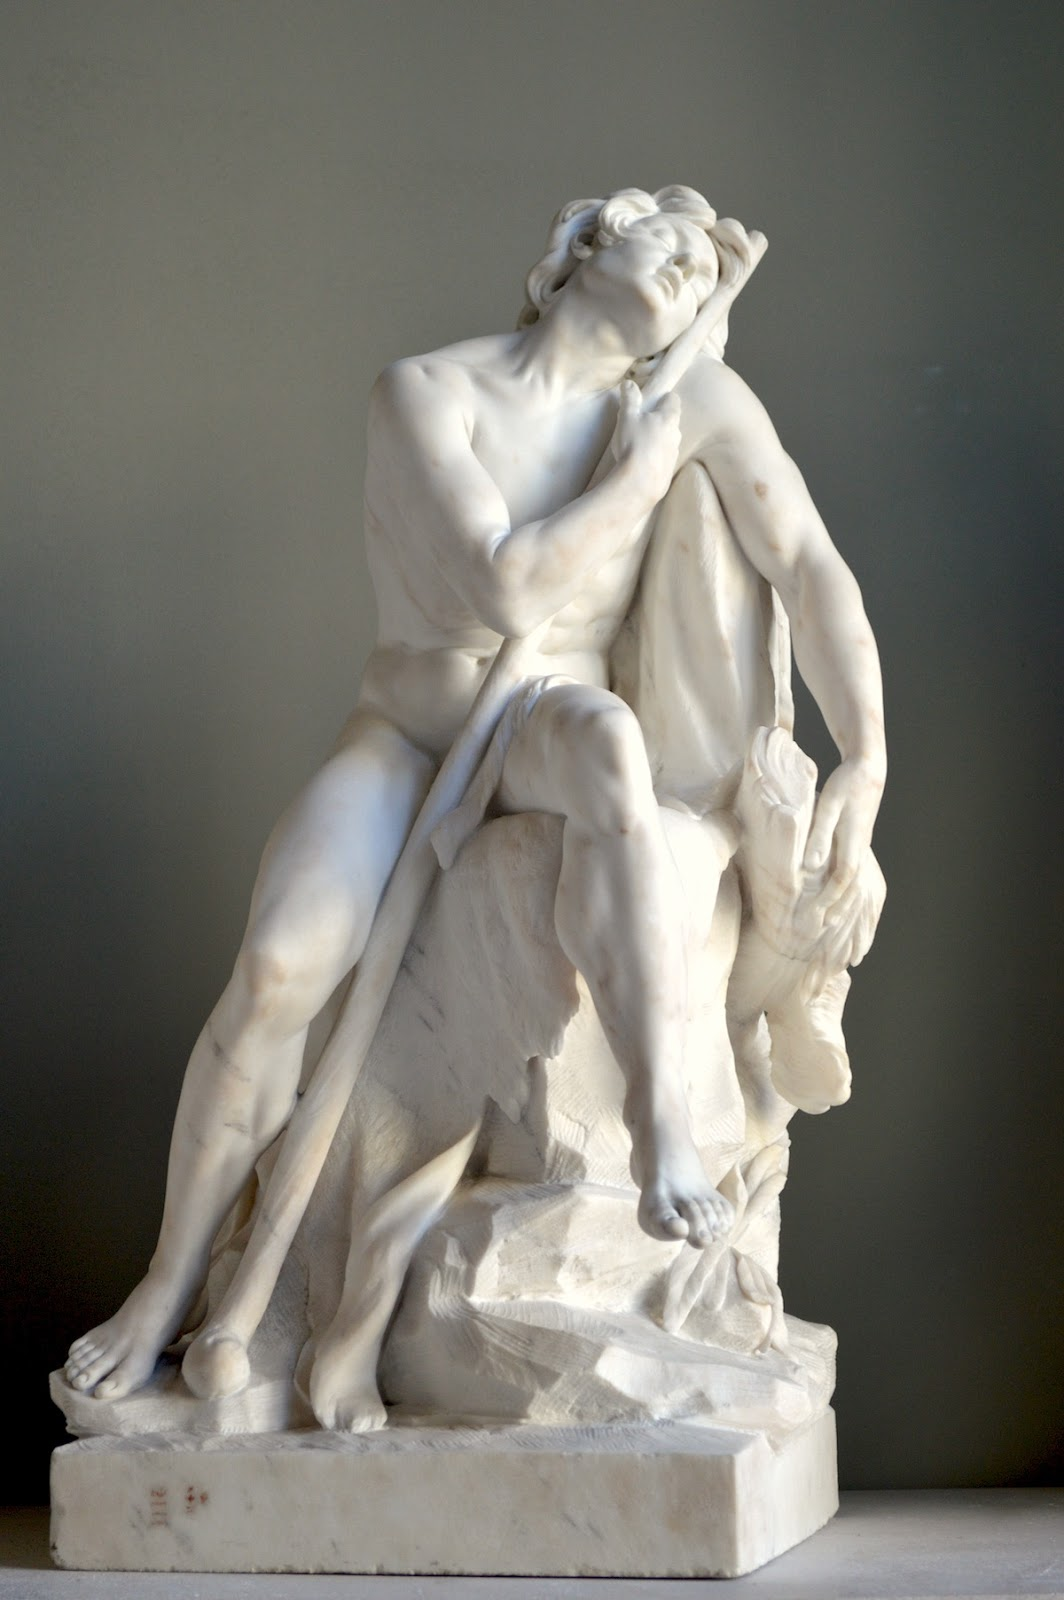 Figurative Sculpture - Melanie Furtado: Sculptures of ...